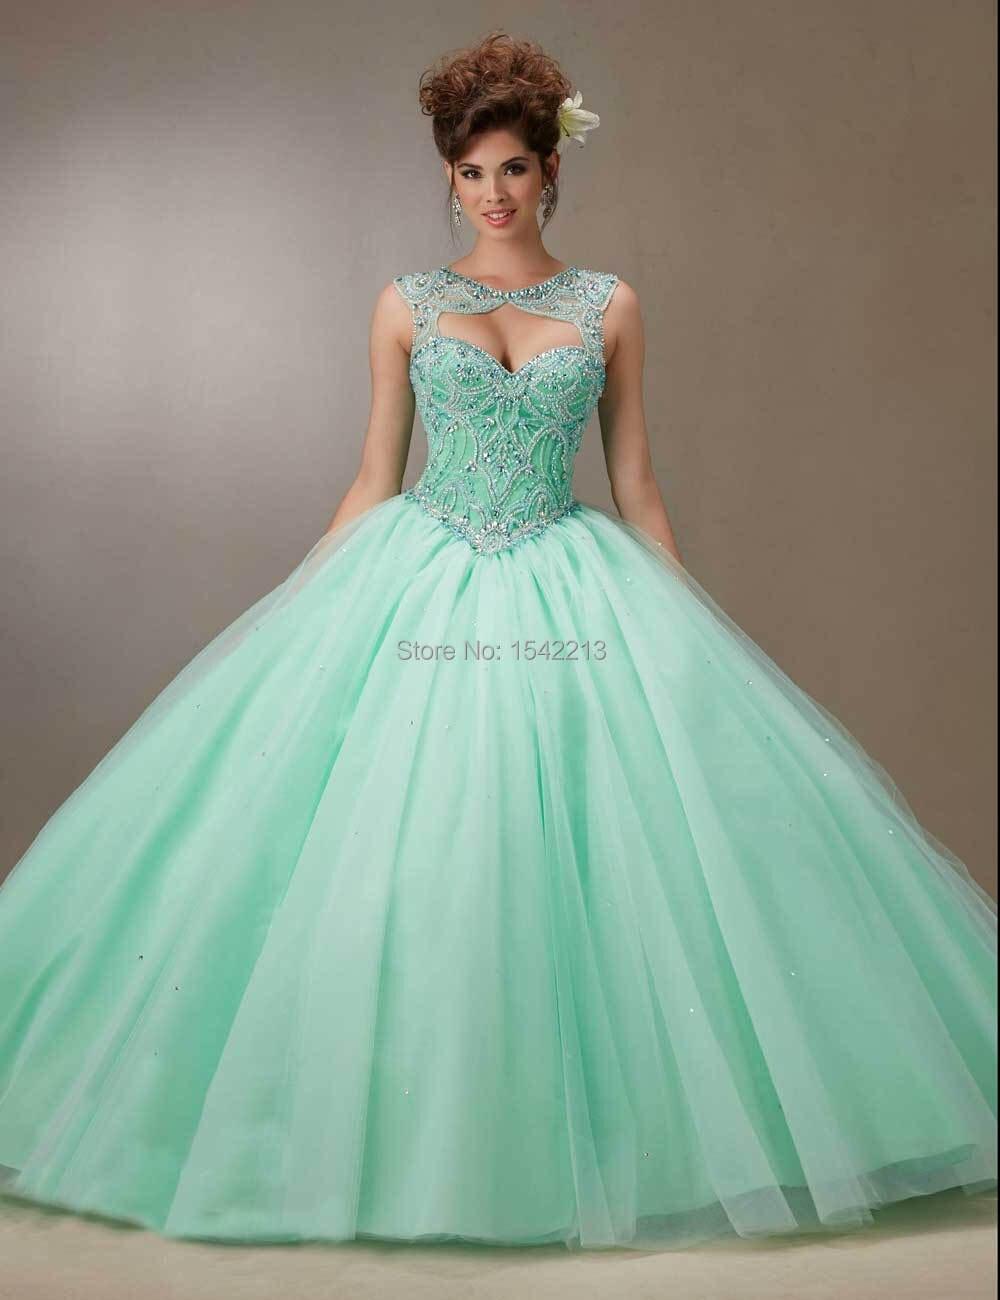 Popular Mint Green Quinceanera Dresses-Buy Cheap Mint Green ...